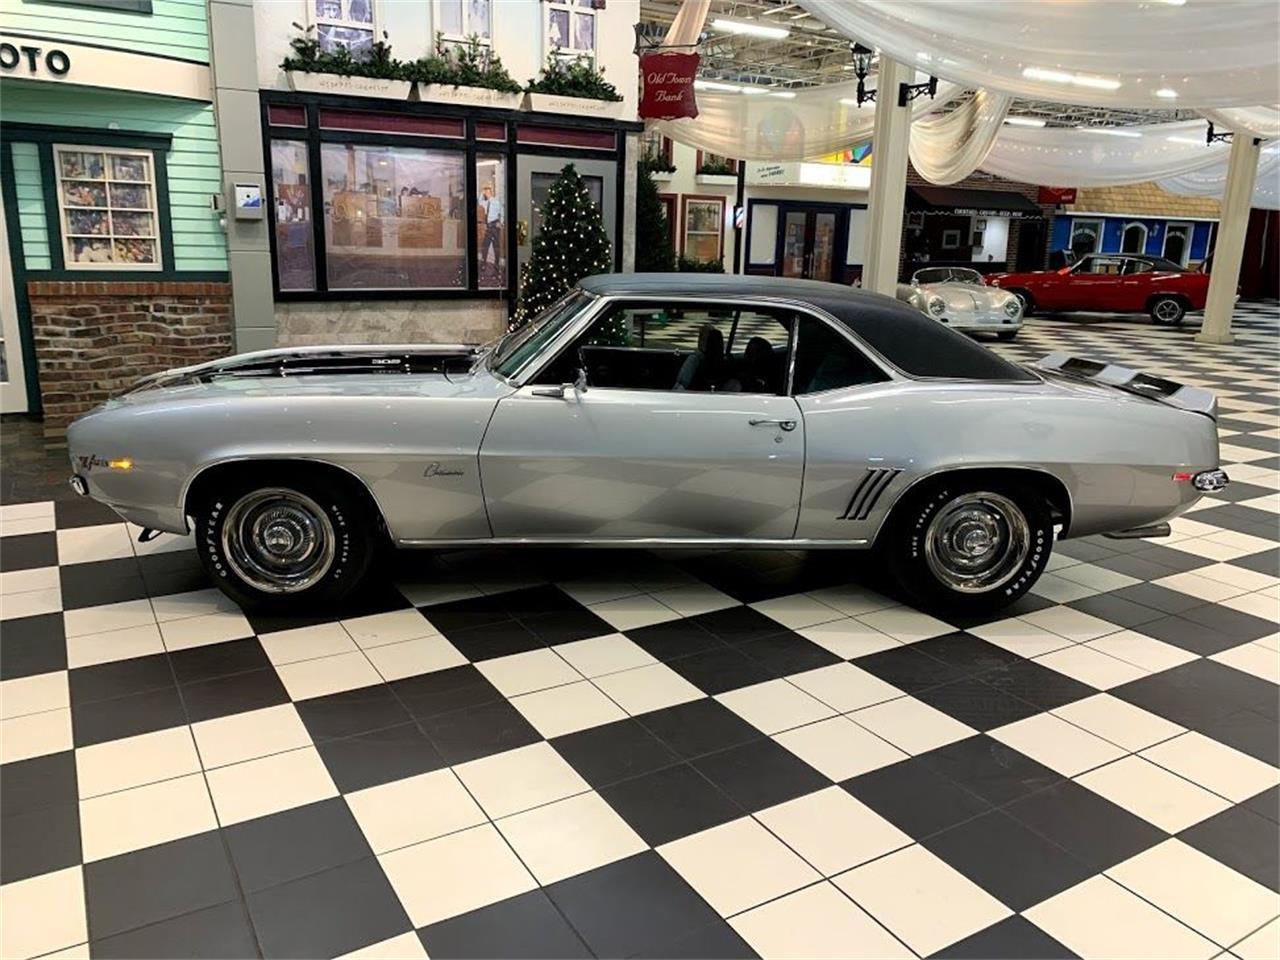 1969 Chevrolet Camaro Z28 (CC-1302336) for sale in Annandale, Minnesota